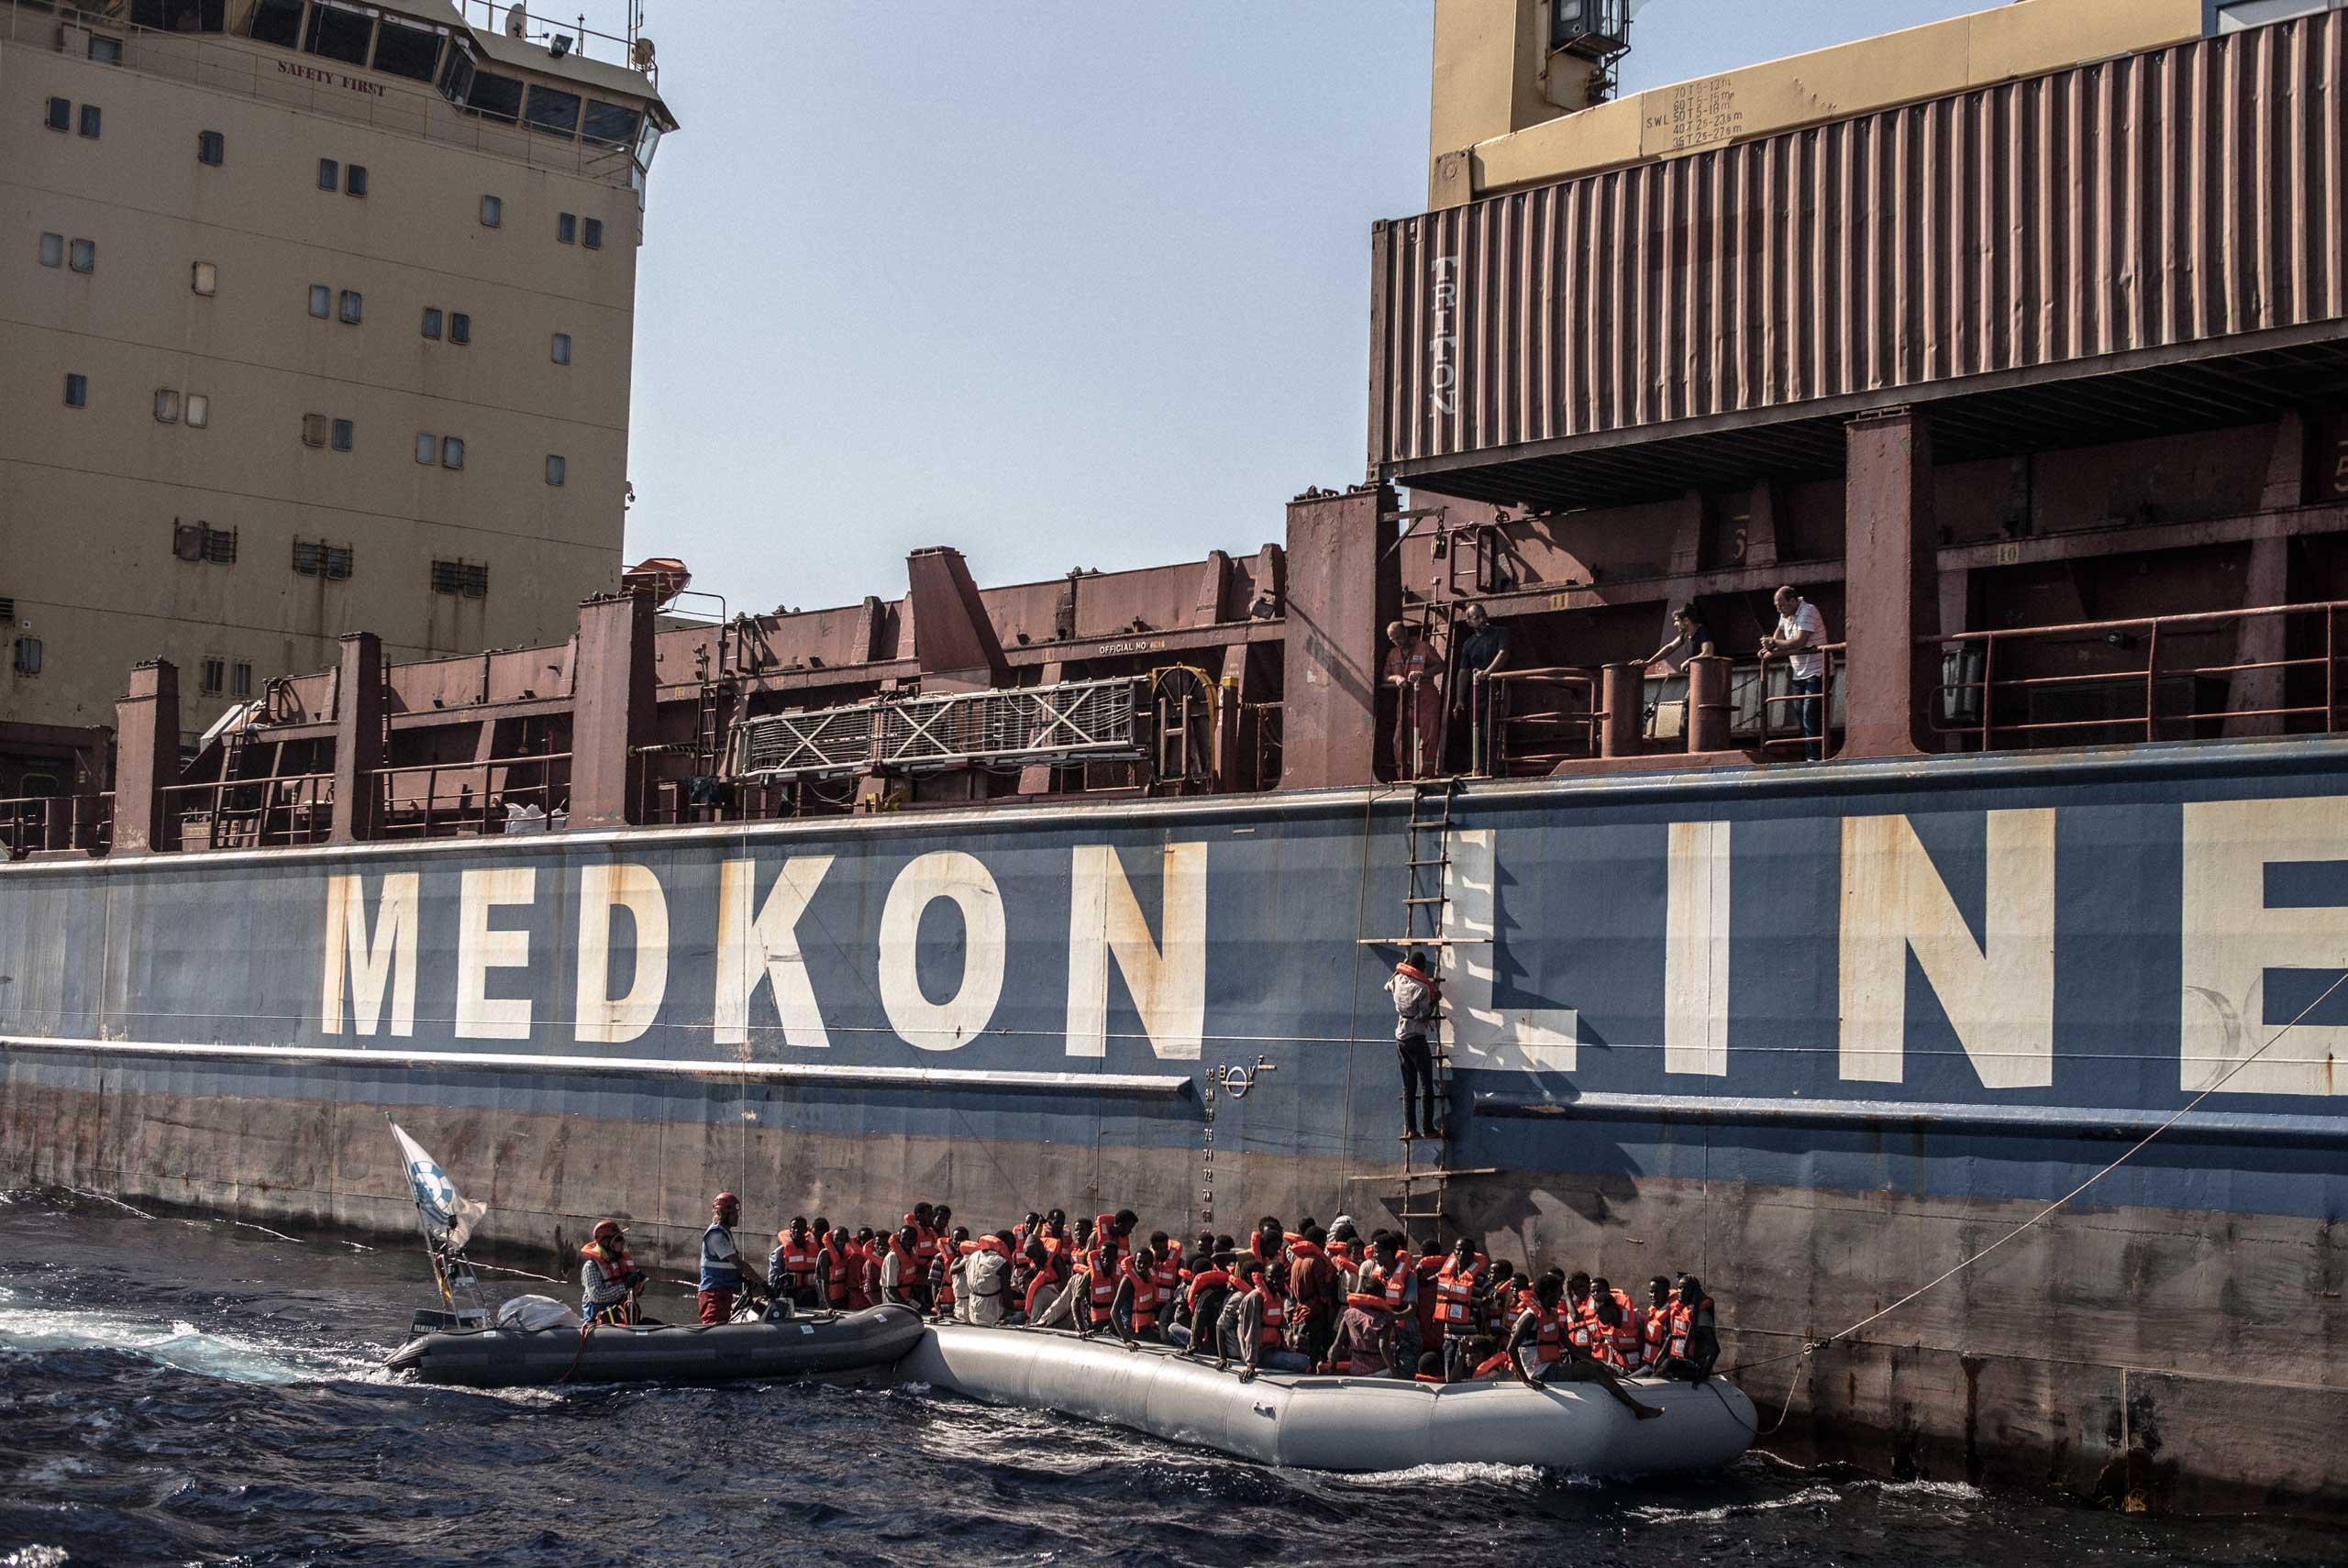 Al Jazeera America: Hands Across WaterThe crew of the Sea-Watch assists migrants boarding the freight ship Shaya, Mediterranean Sea,  on July 23, 2015.